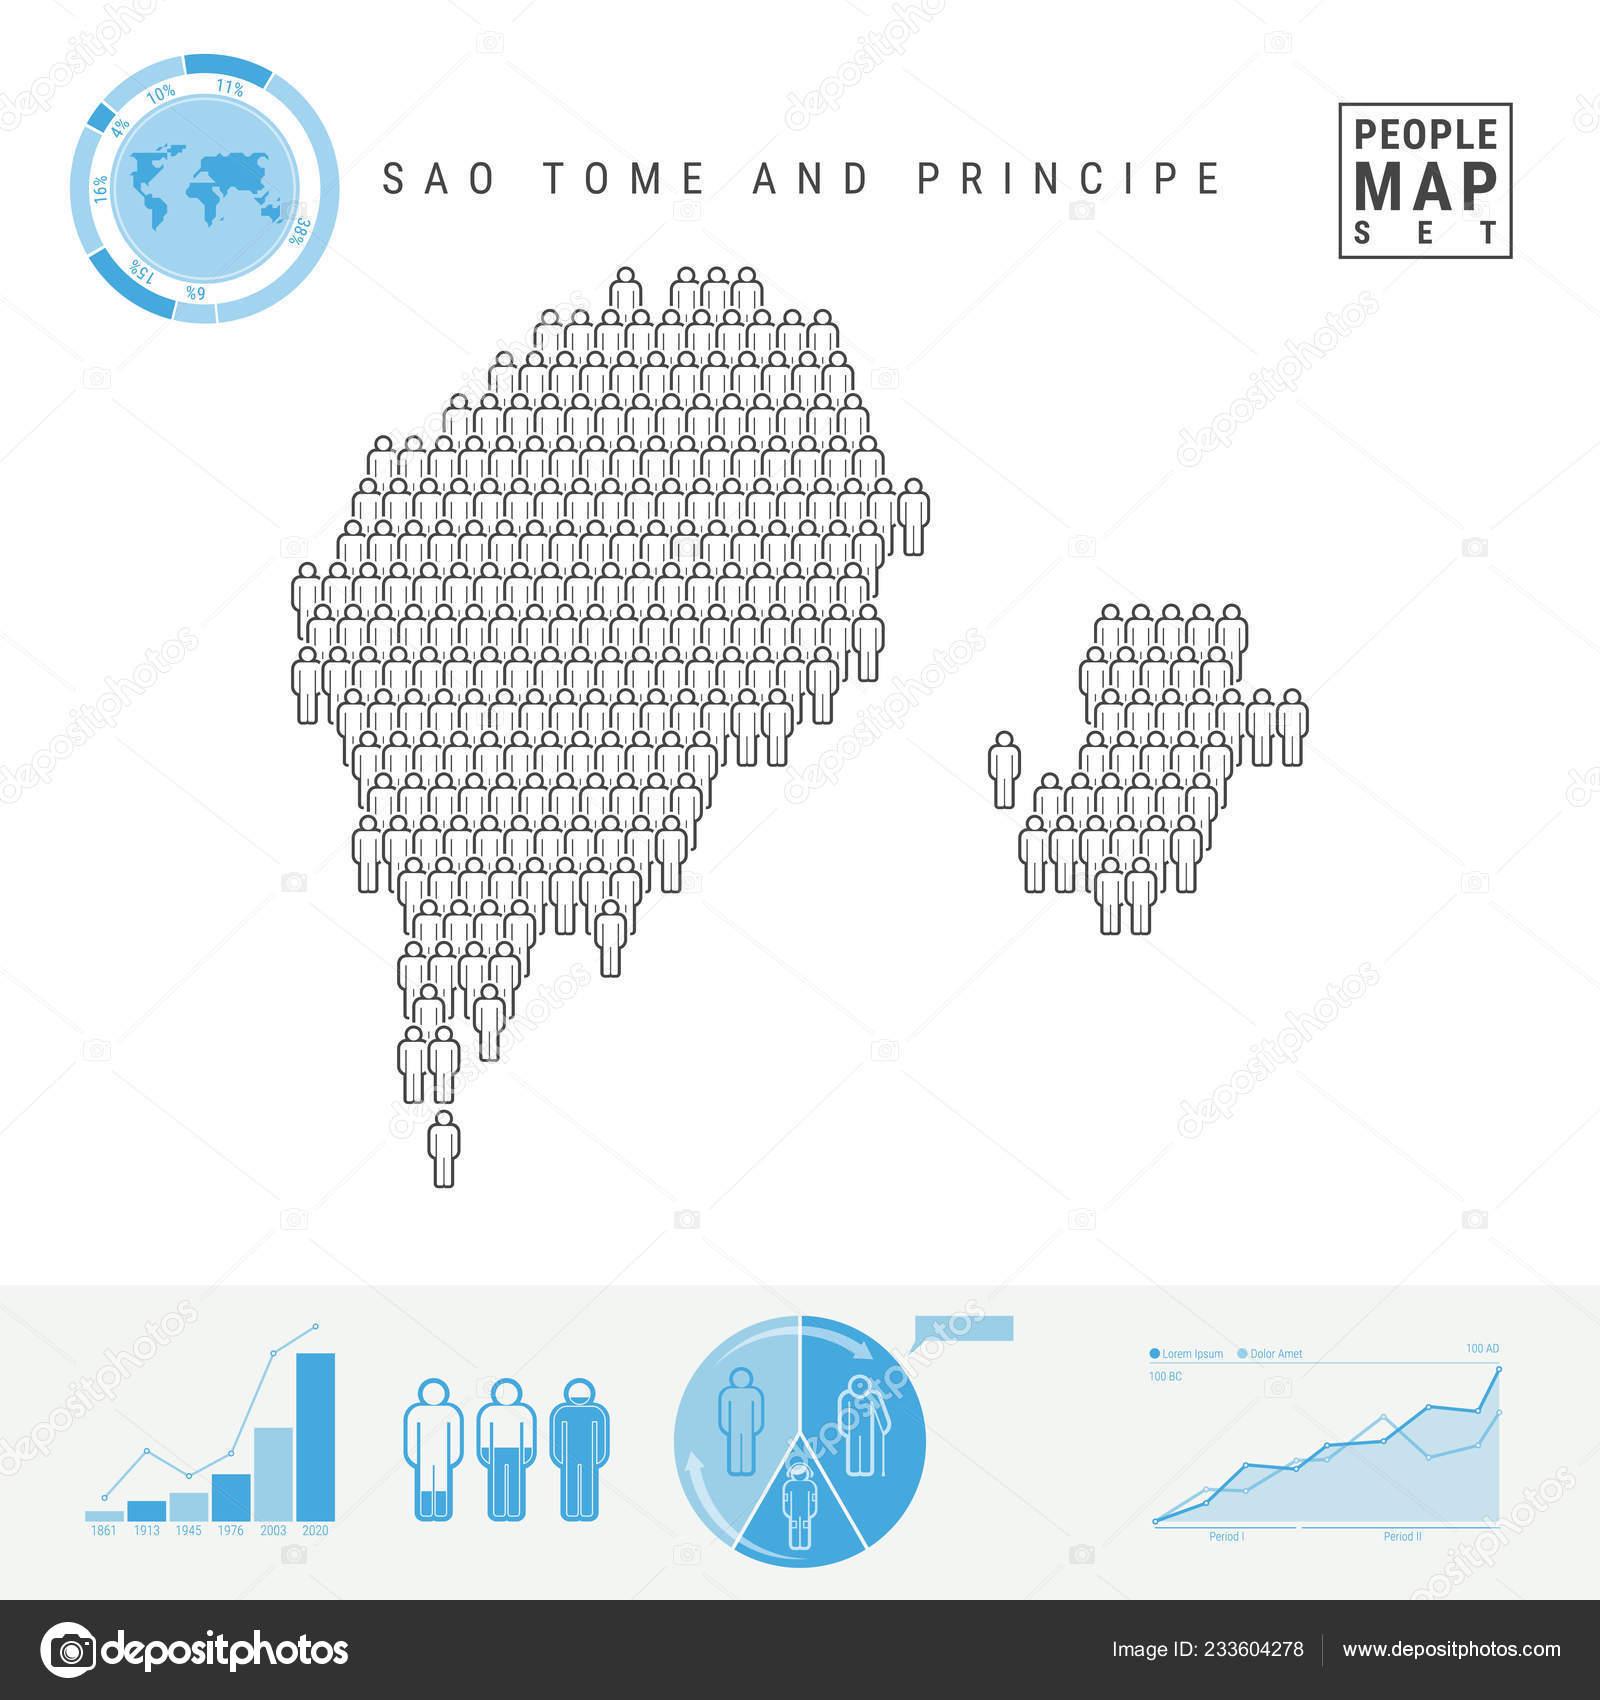 Sao Tome Principe People Icon Map People Crowd Shape Map ... Sao Tome Principe Map on eritrea map, hong kong map, u.a.e. map, saudi arabia map, seychelles map, trinidad & tobago map, united arab emirates map, tanzania map, central african republic map, principe island map, bangladesh map, comoros map, tunisia map, niue map, honshu island map, tokelau map, sri lanka map, lesotho map, new britain island map,